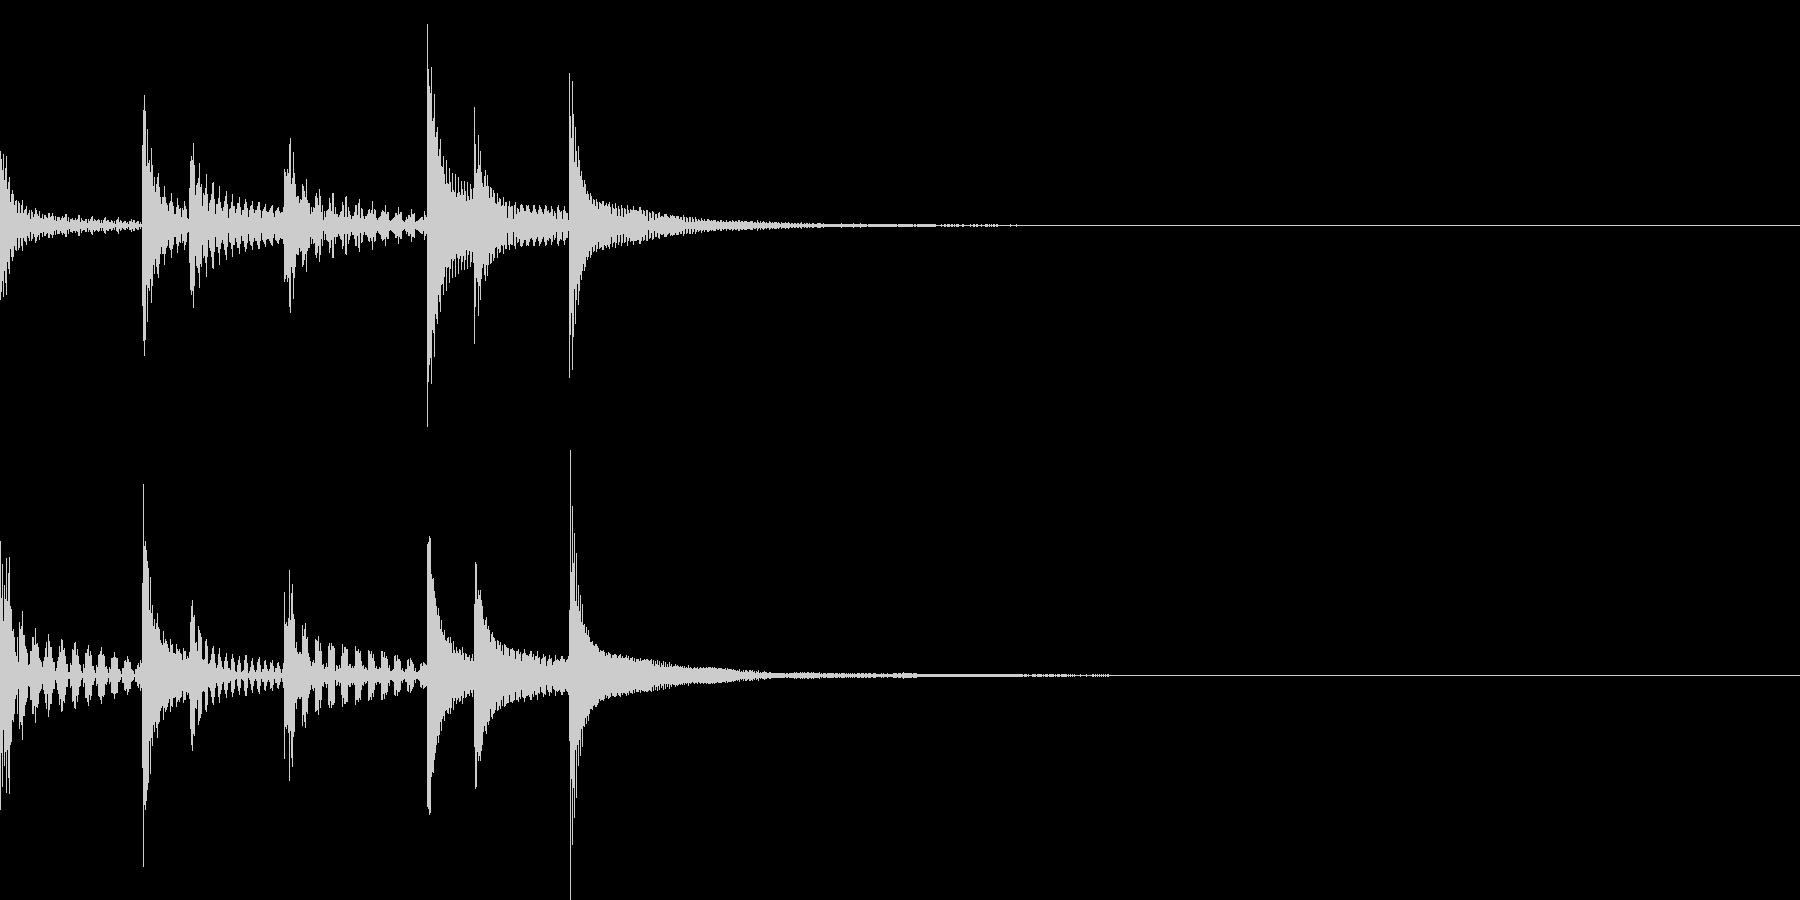 SF宇宙ぽいテクノな効果音/ピンチ/急ぐの未再生の波形